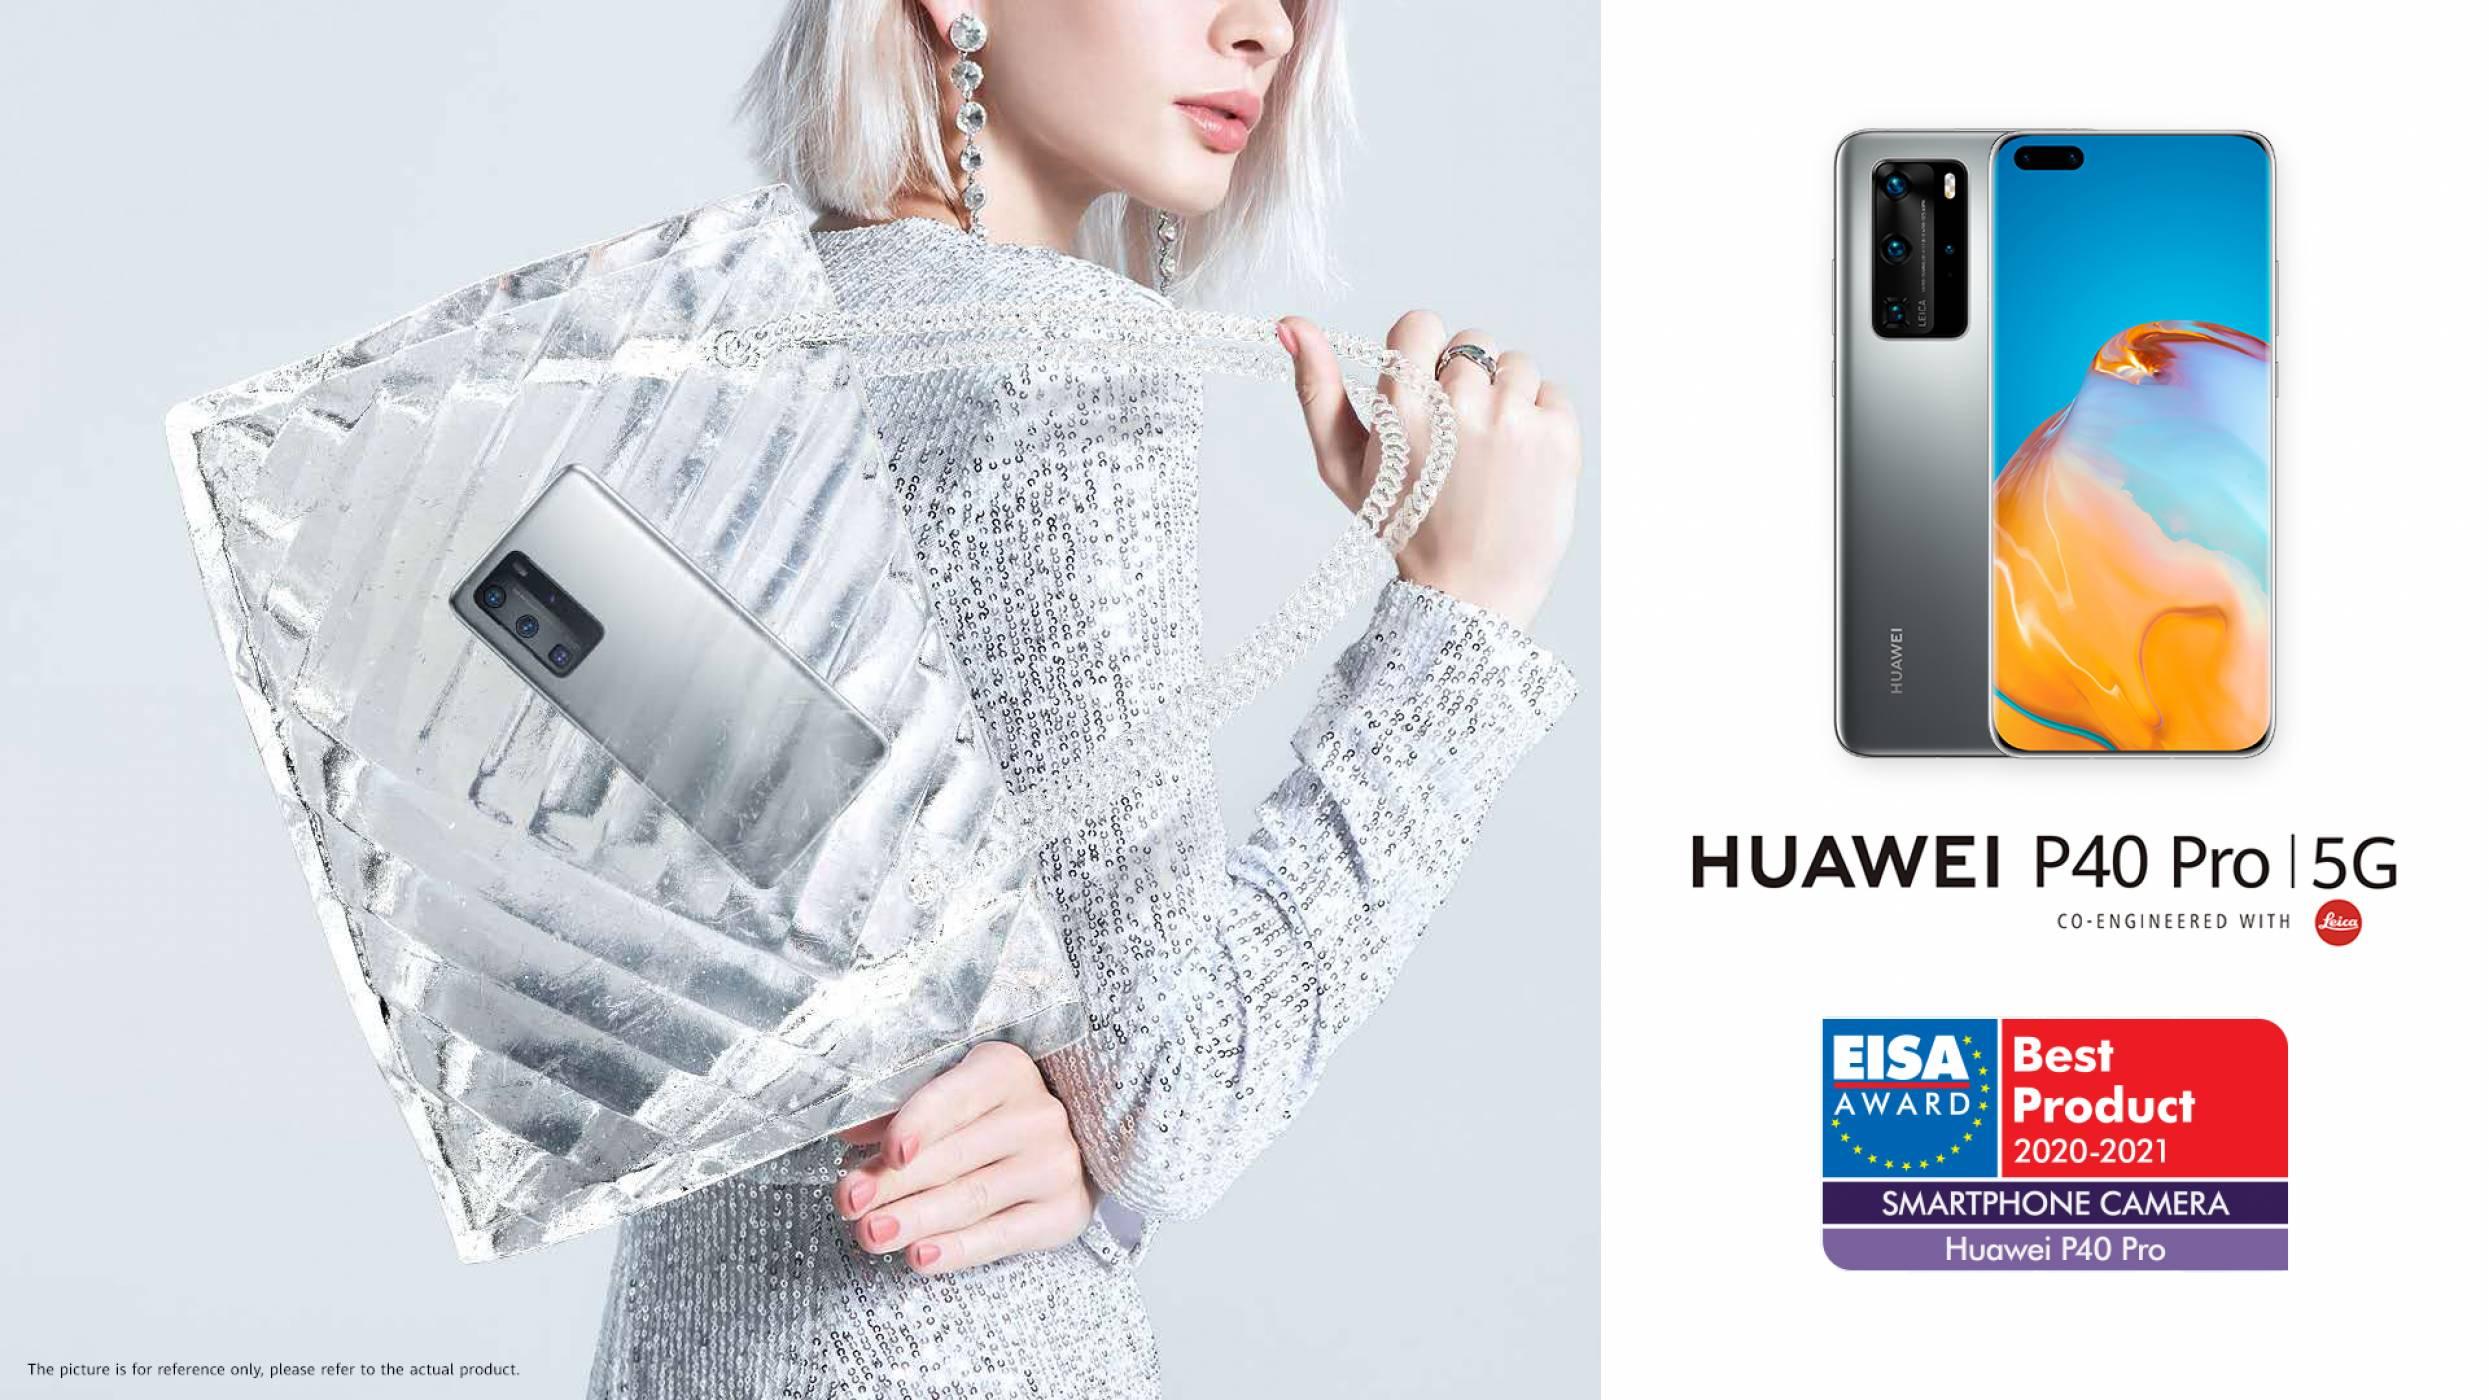 Huawei спечели две награди от EISA с HUAWEI P40 Pro и WATCH GT 2